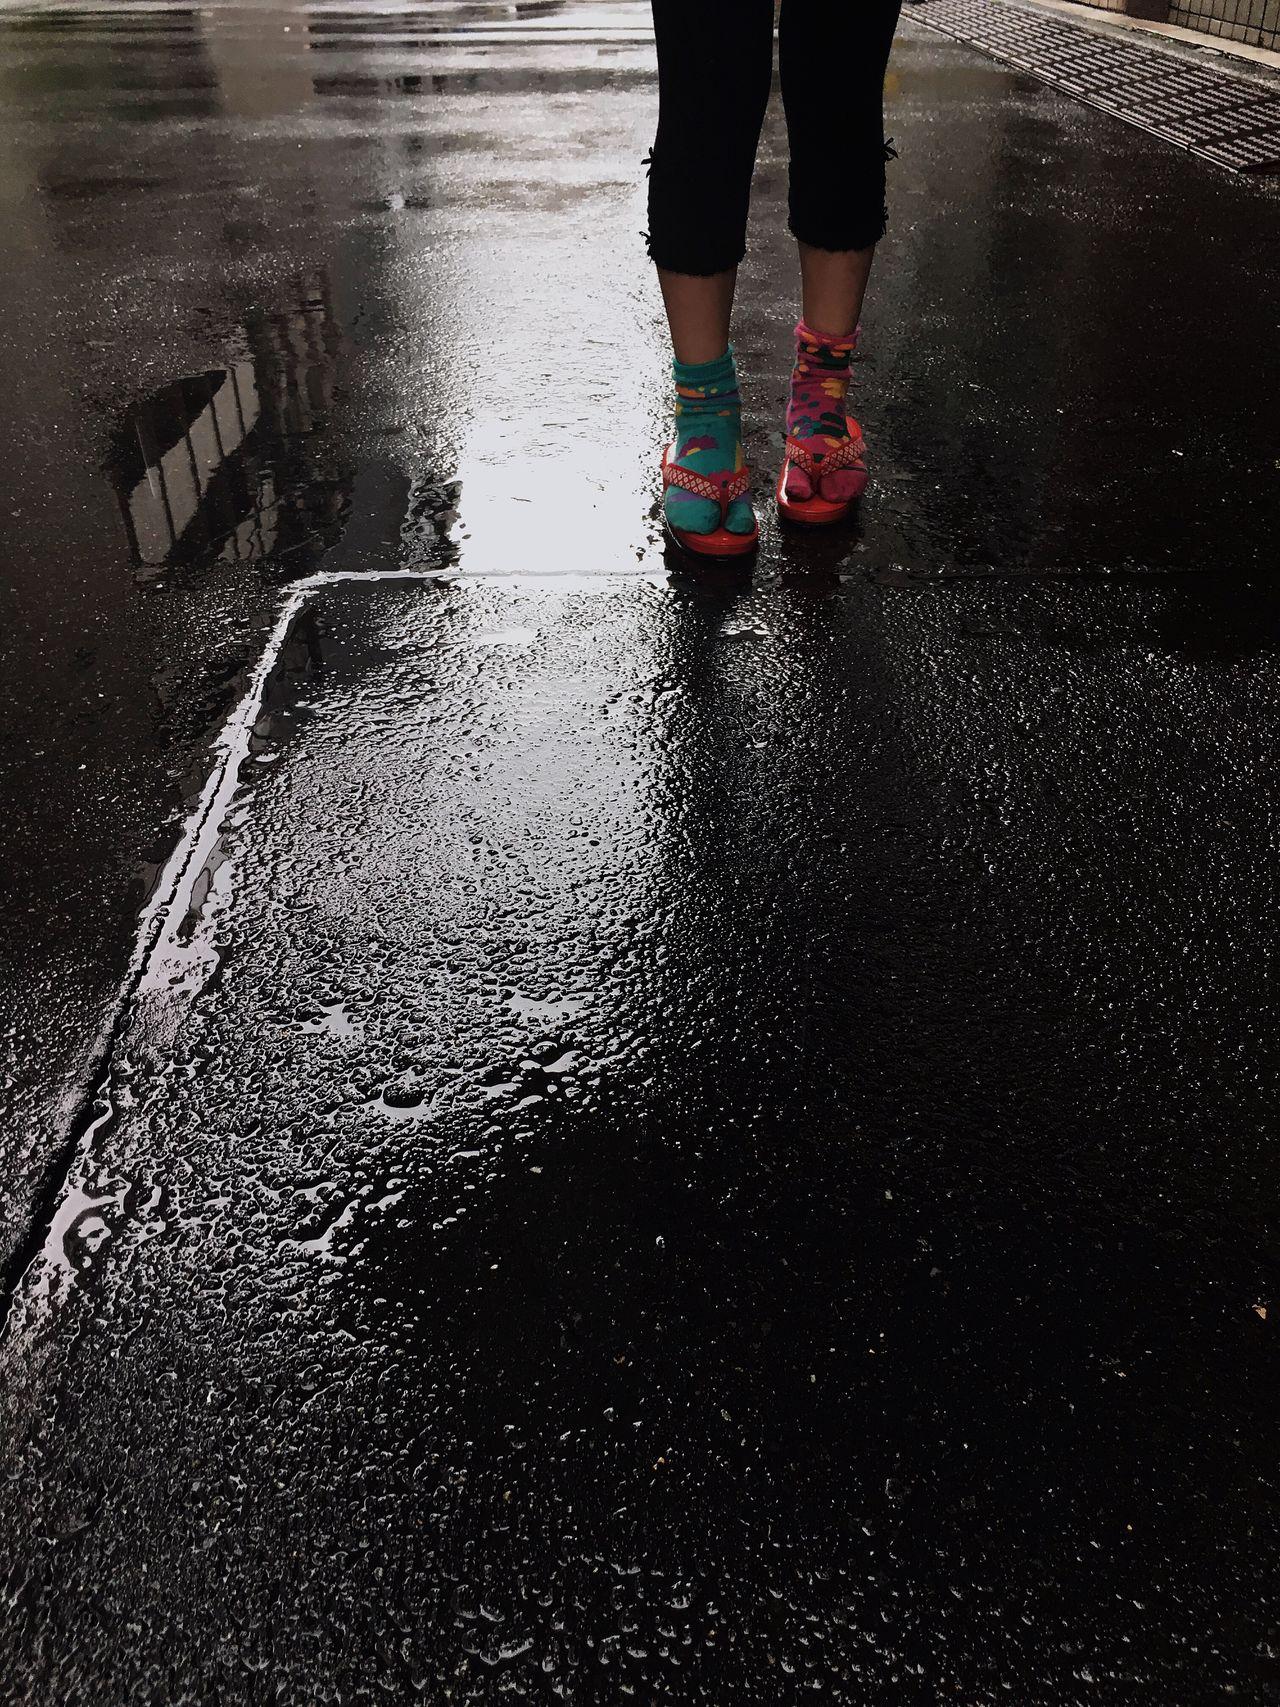 Rain Wet Daughter Family Puddle Rainy Days